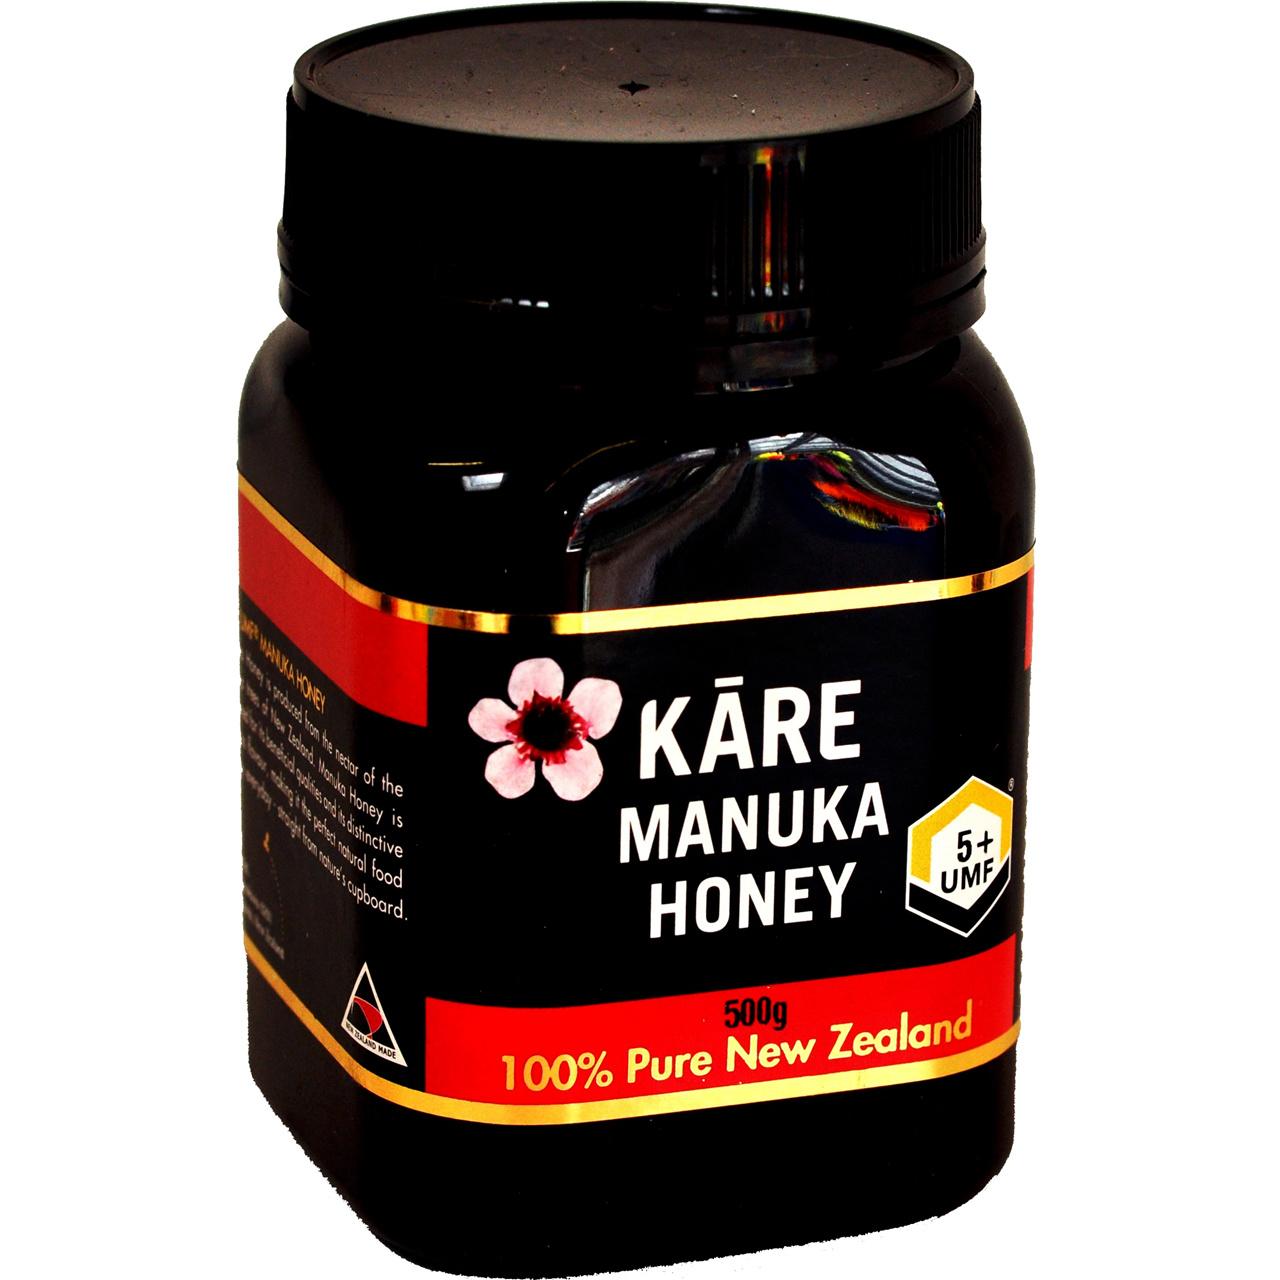 Chemical analysis of manuka honey